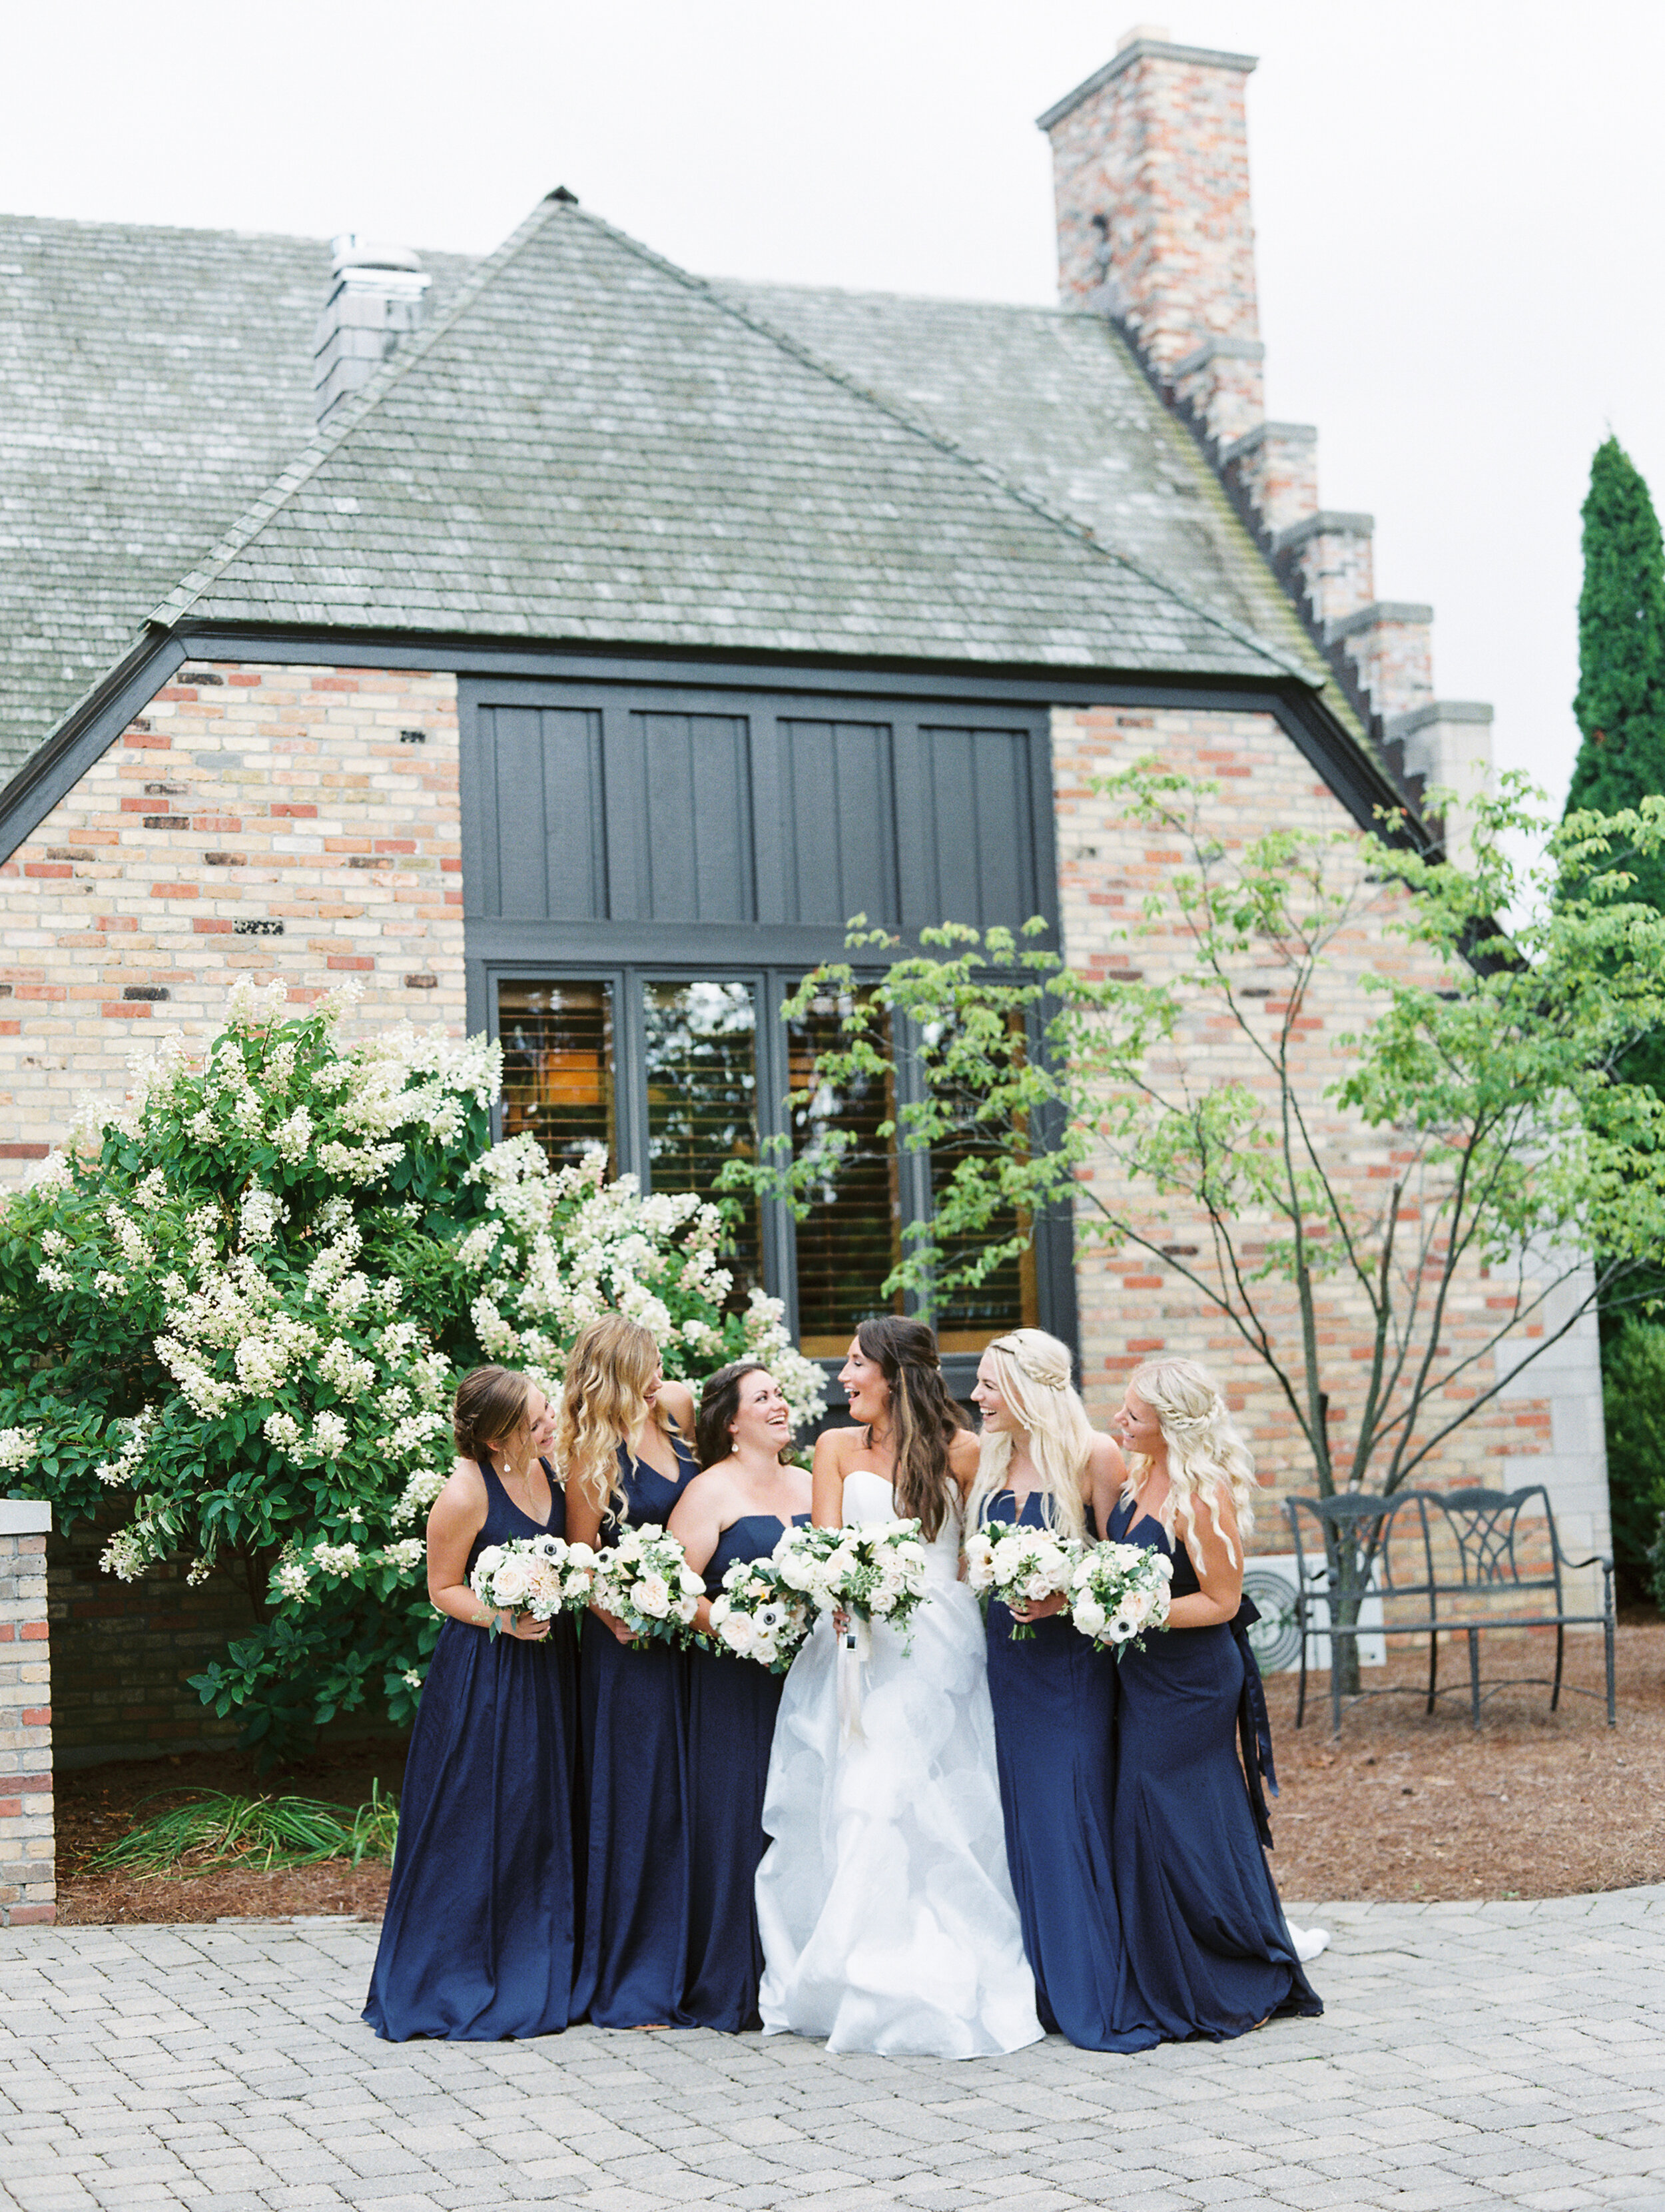 Kuiper+Wedding+Reception+Bridal+Party-109.jpg